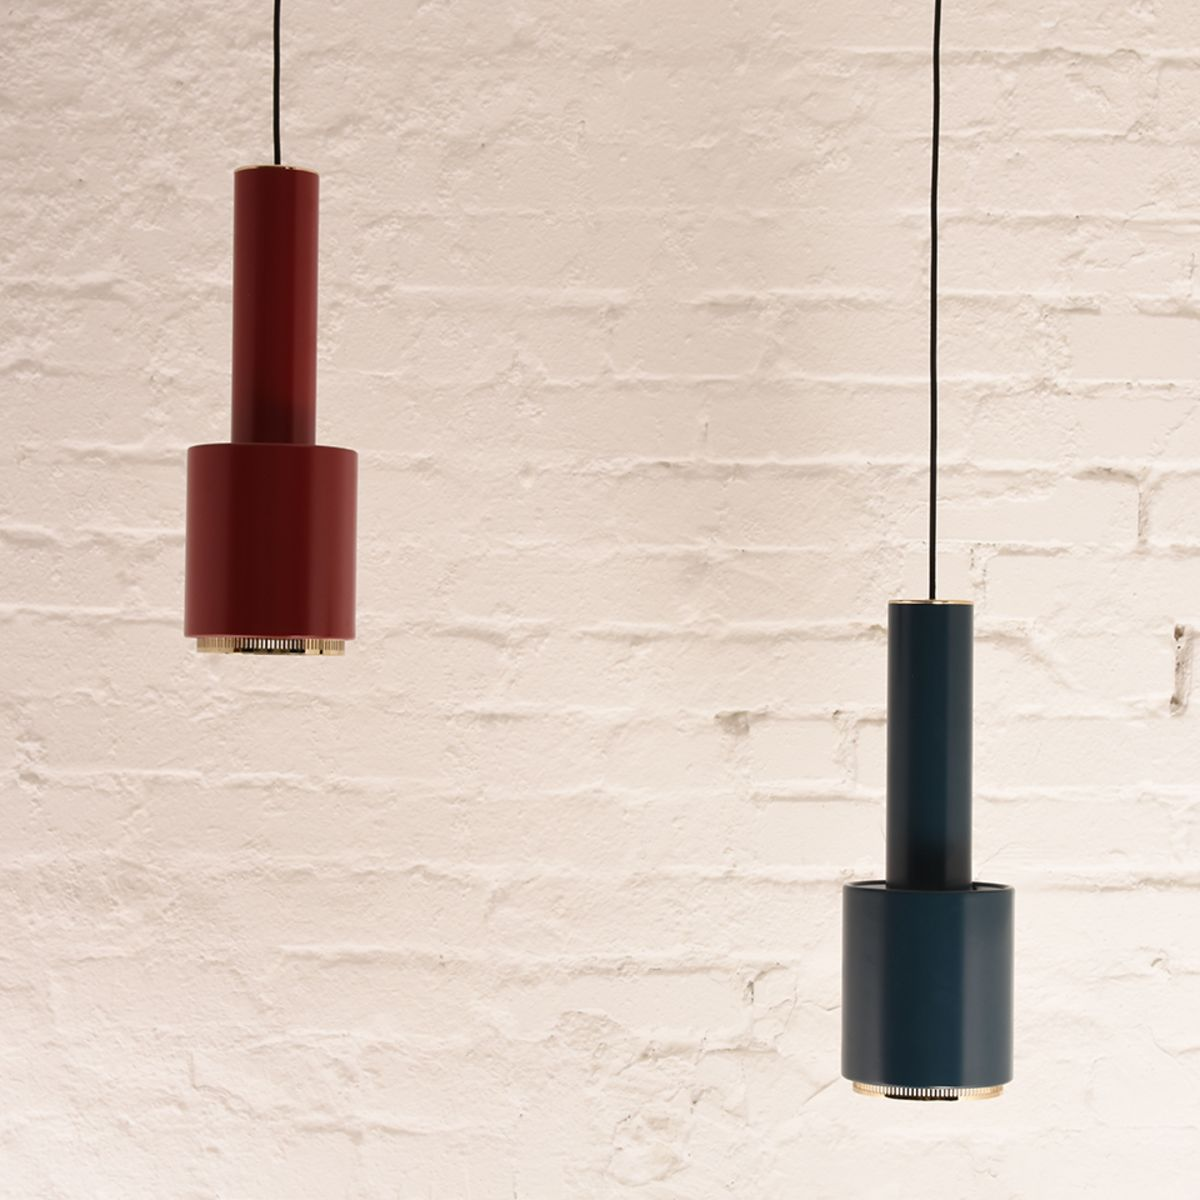 Alvar-Aalto_A101-Lamp